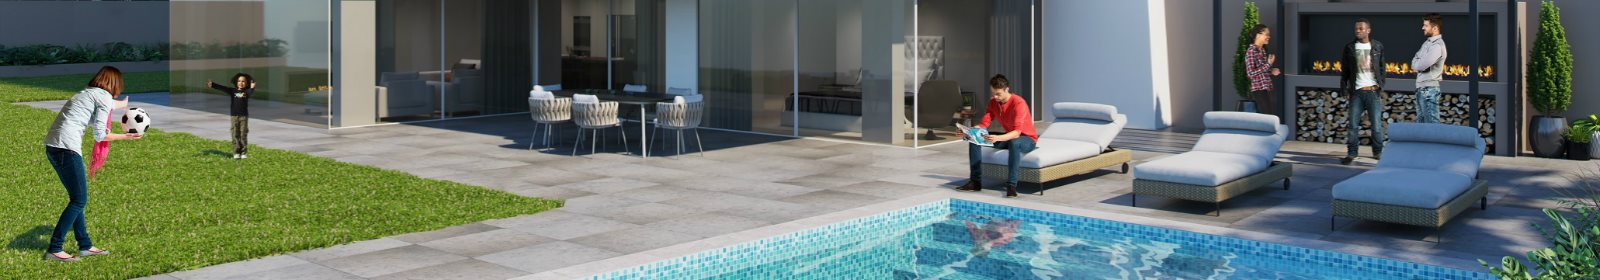 Macaron Blue, new luxury development for Blouberg